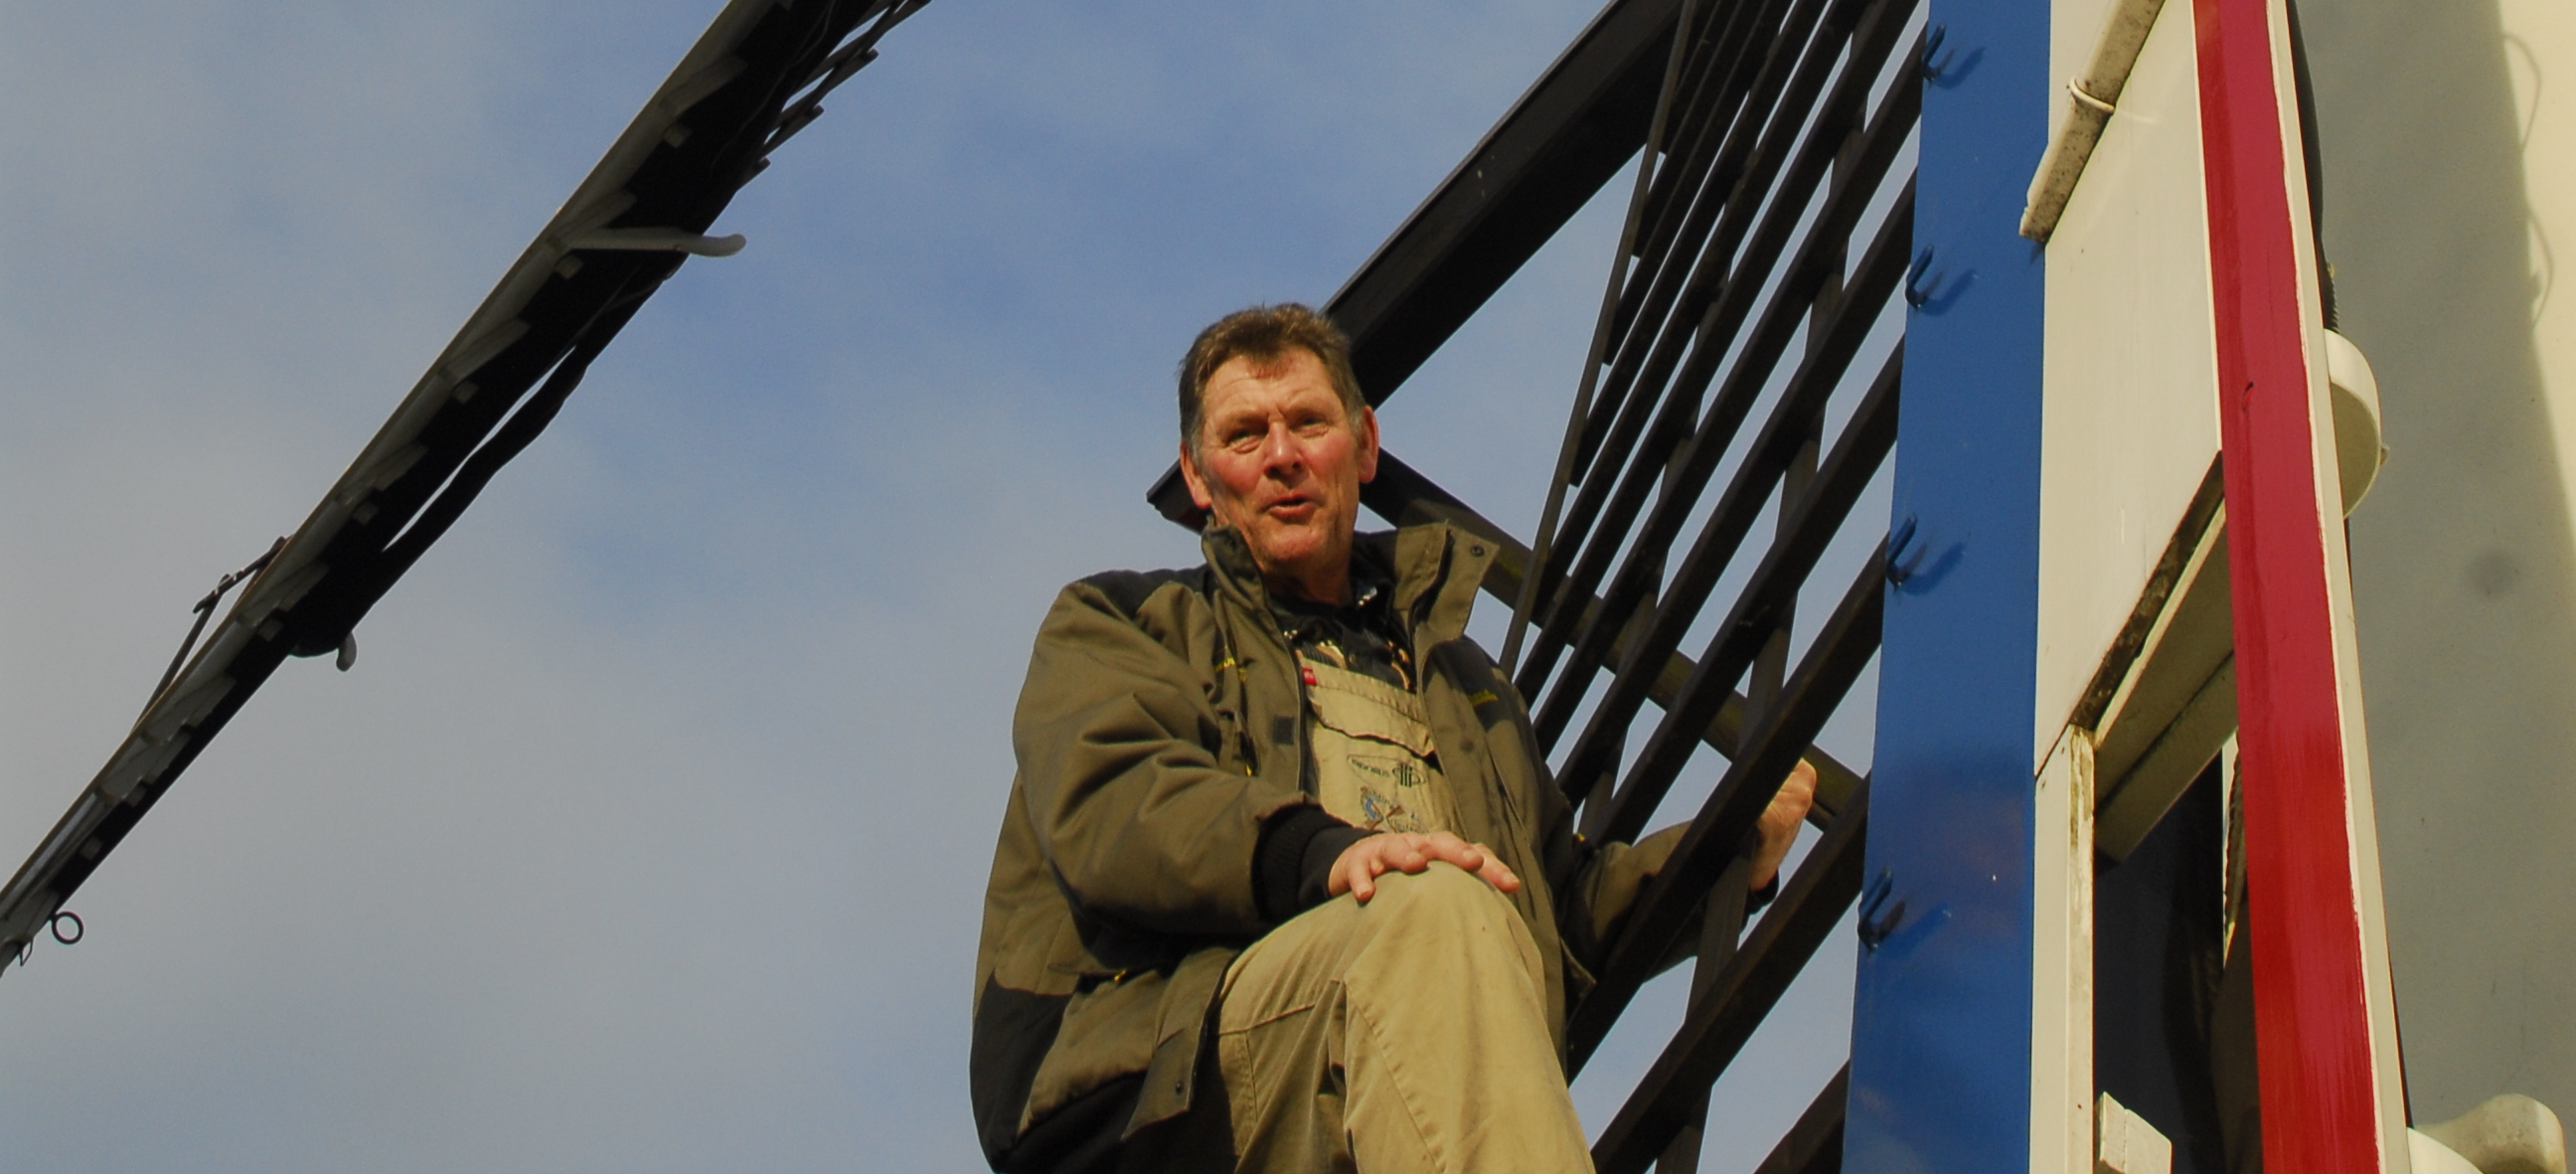 Vrijwillig molenaar Chris Venner.